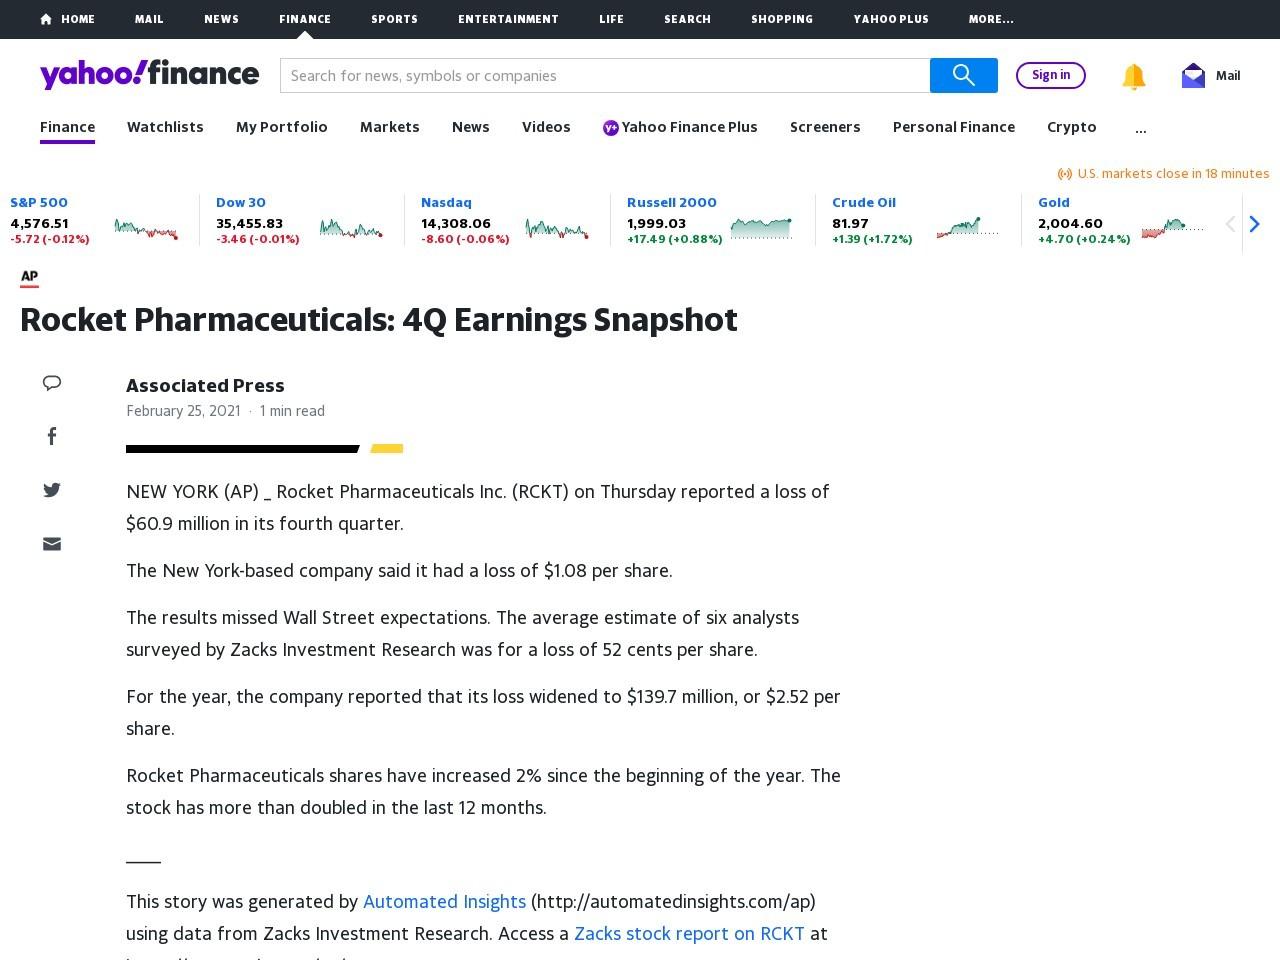 Rocket Pharmaceuticals: 4Q Earnings Snapshot – Yahoo Finance